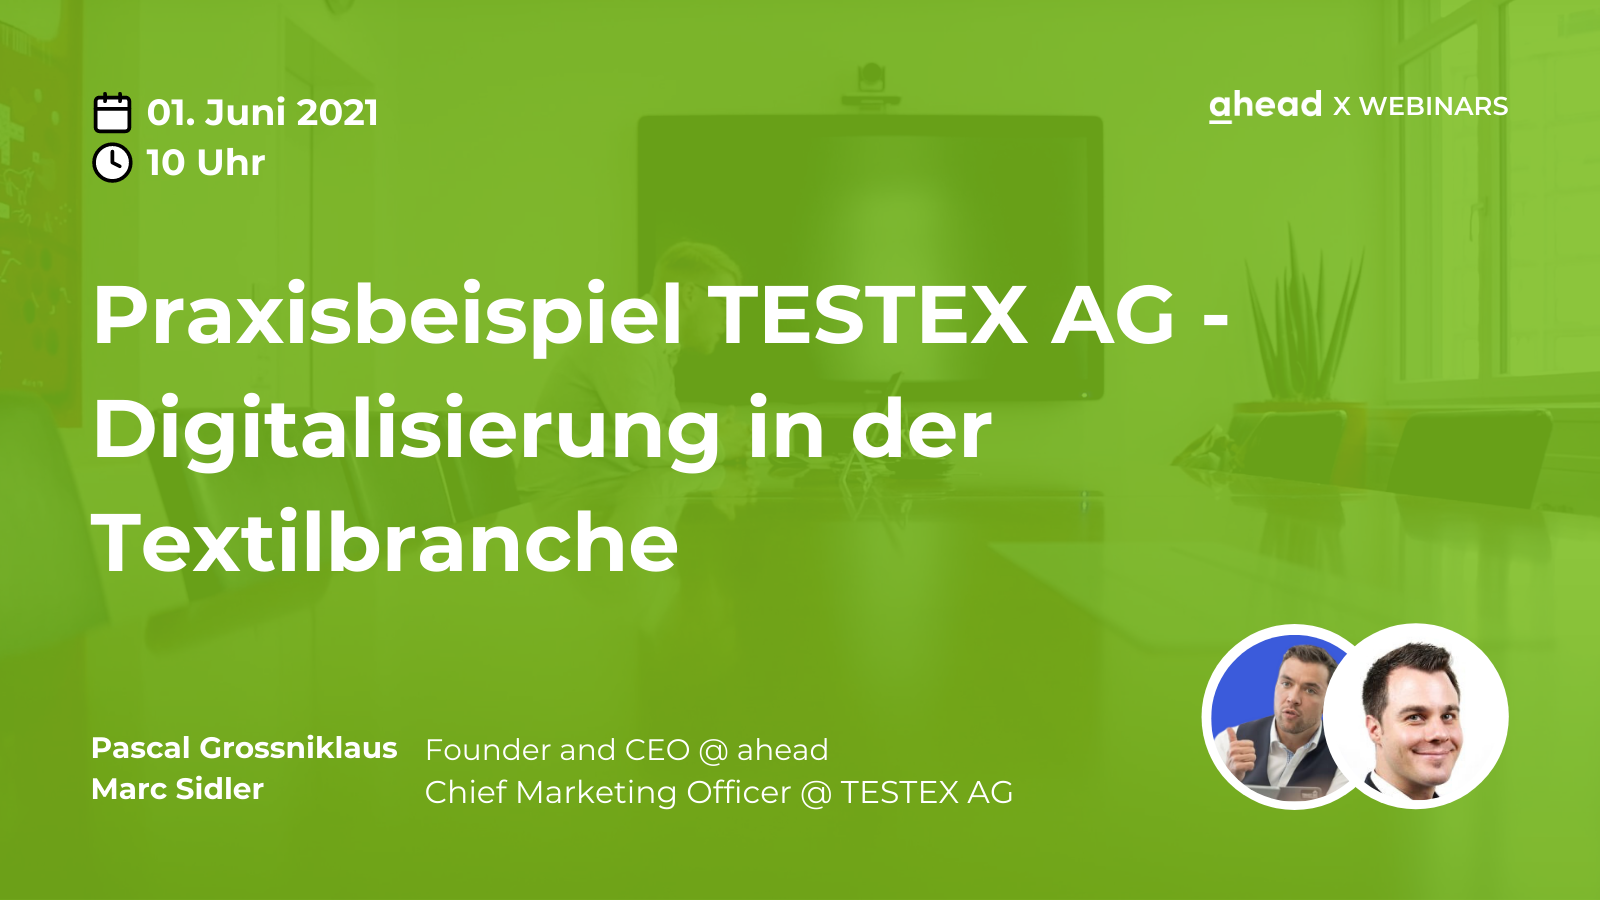 ahead Social Intranet Internal Communications Webinars TESTEX AG